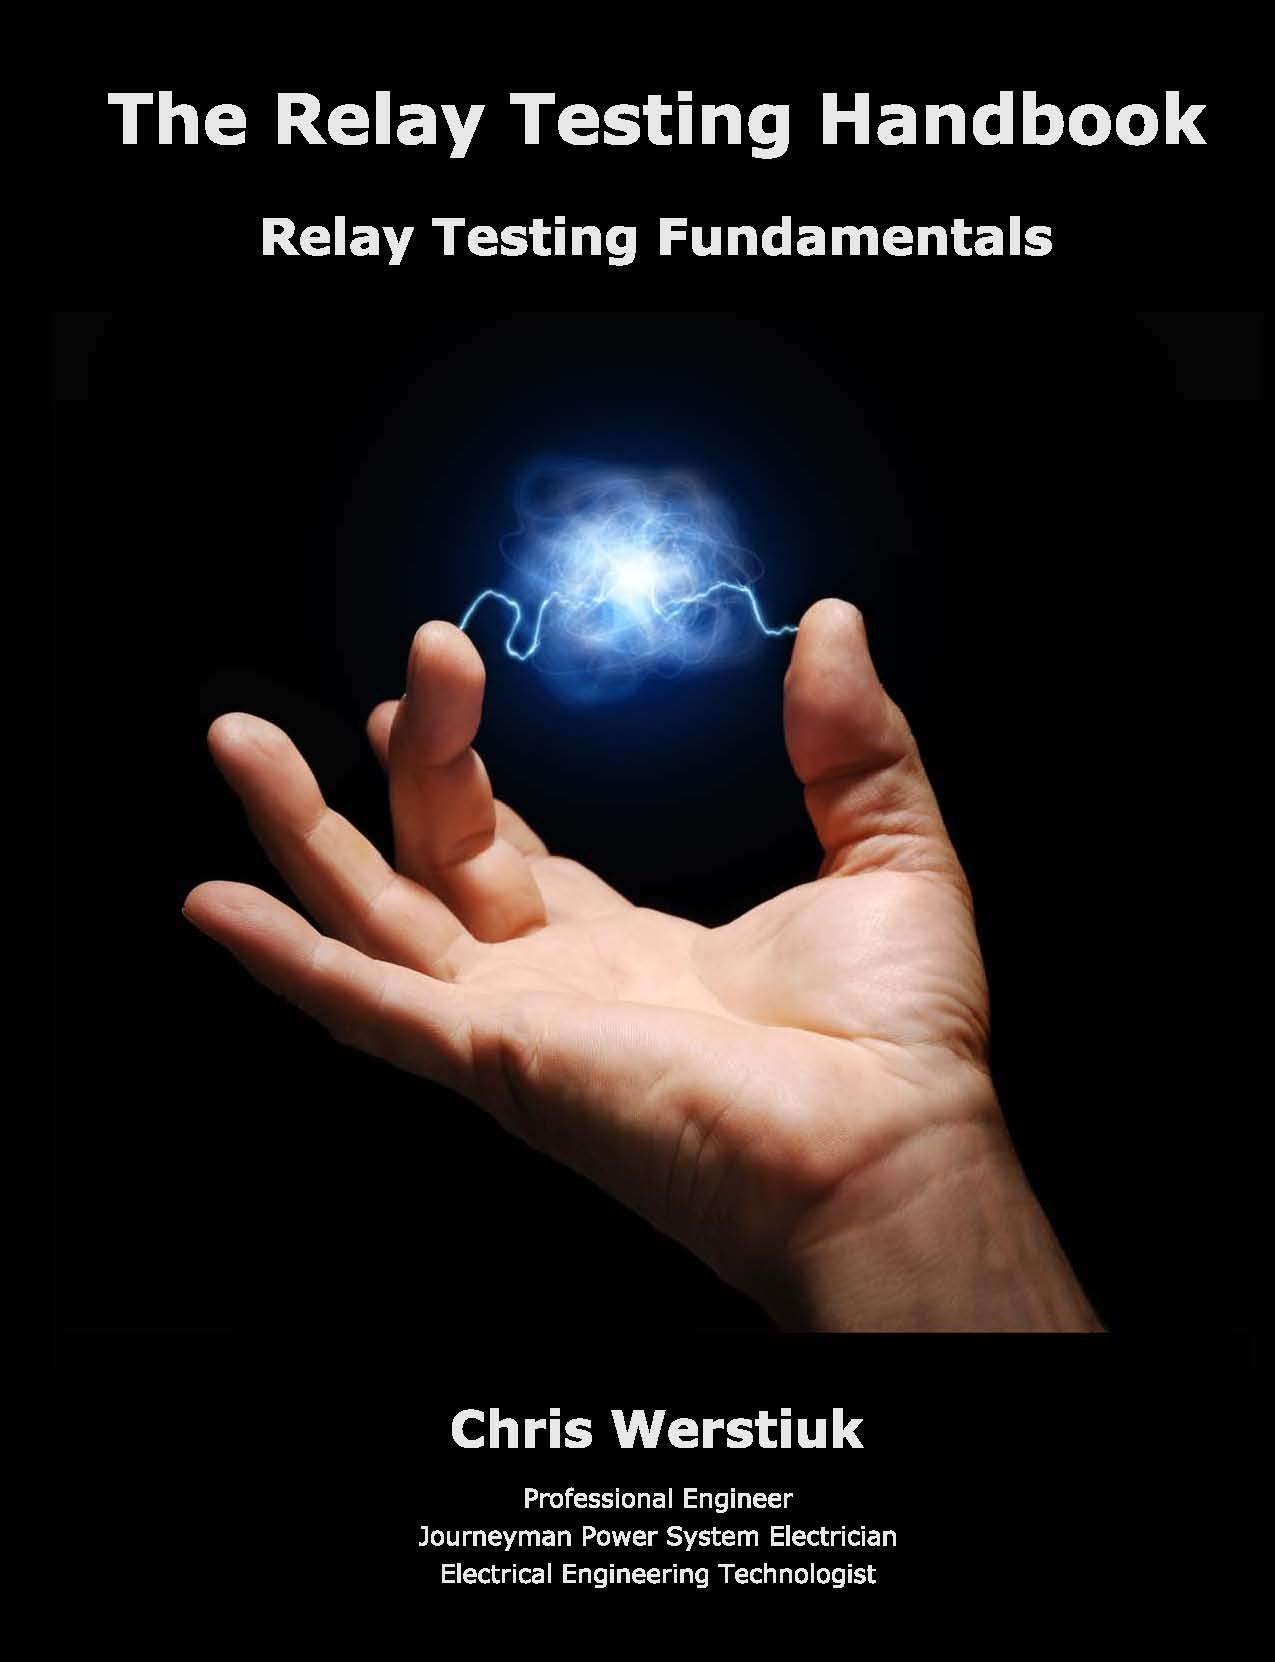 The Relay Testing Handbook 2 Fundamentals Chris Electrical Maintenance Werstiuk 9781934348055 Books